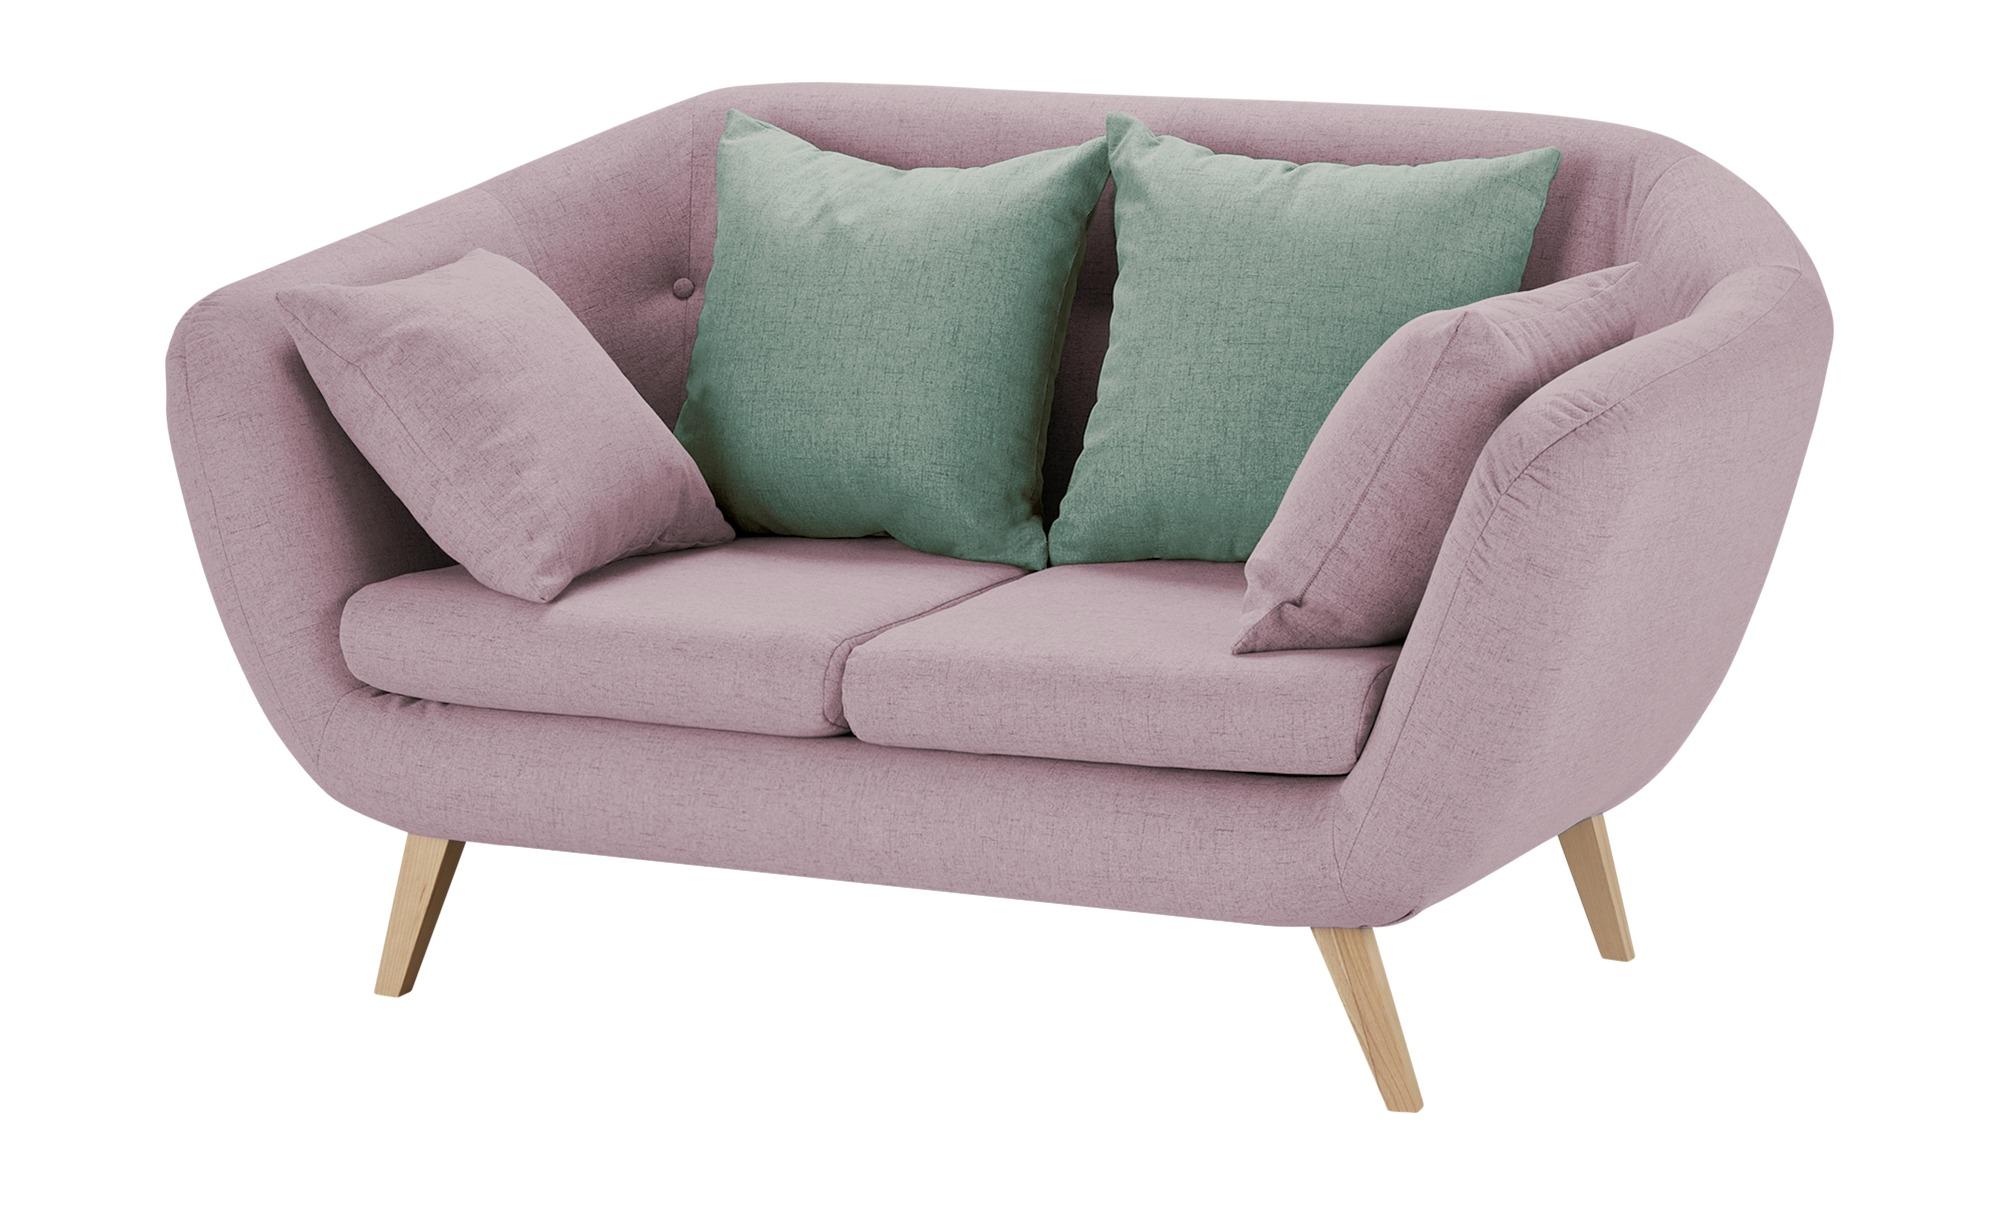 smart Sofa  altrosa - Flachgewebe Ricarda ¦ rosa/pink ¦ Maße (cm): B: 176 H: 93 T: 90 Polstermöbel > Sofas > 2-Sitzer - Höffner